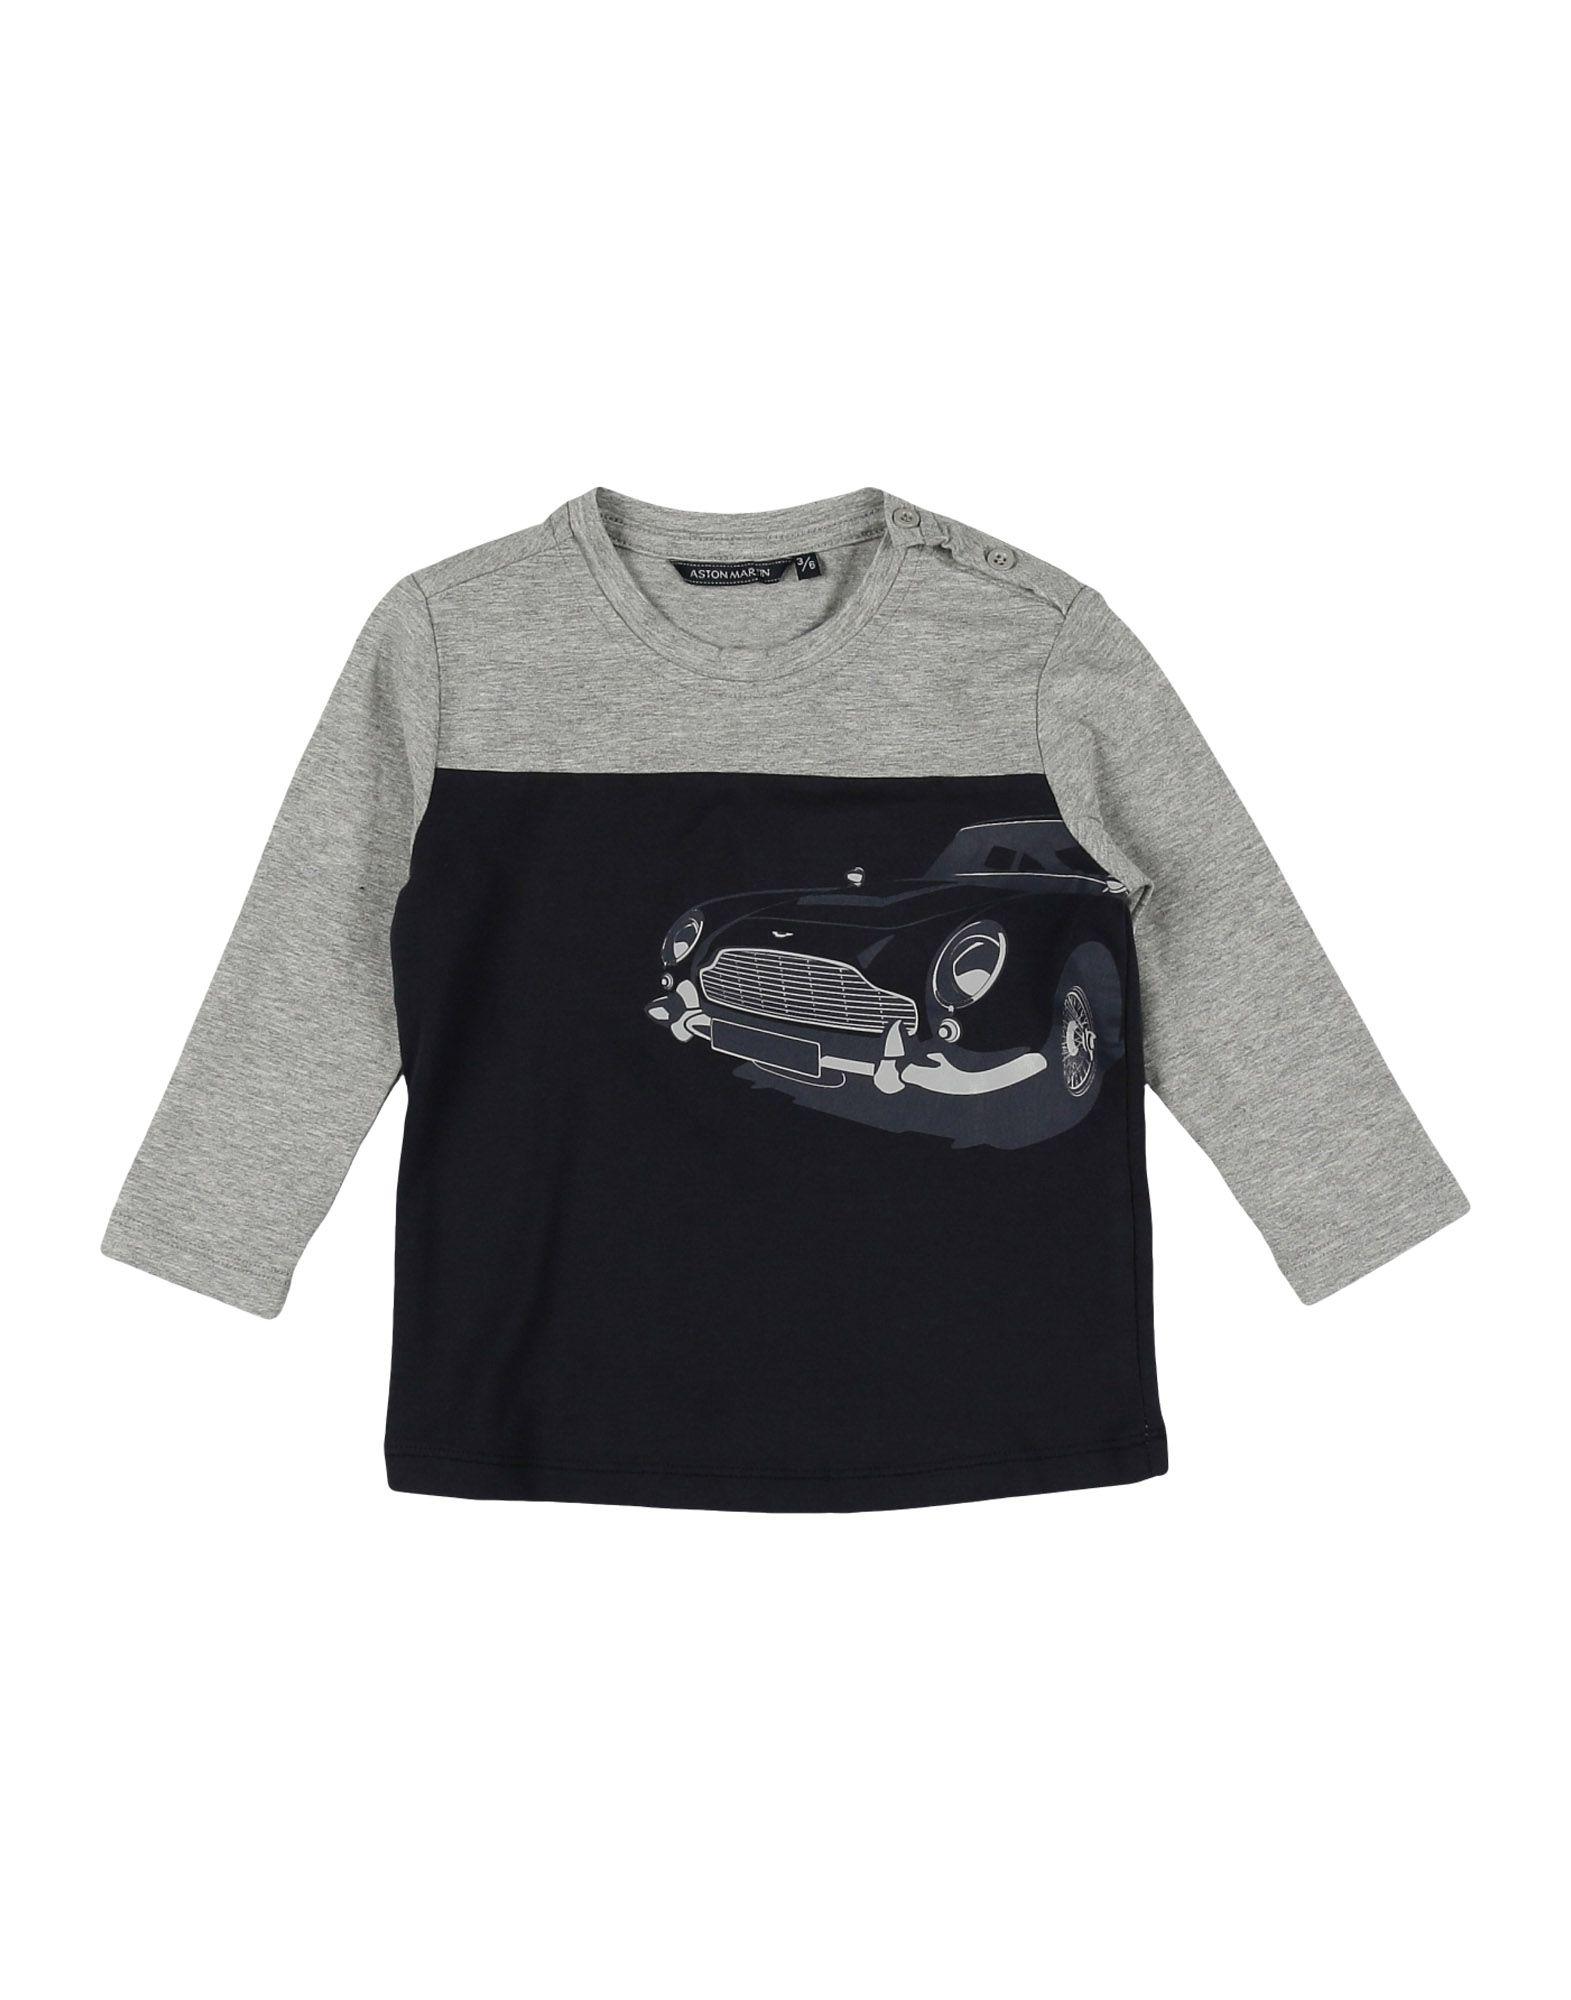 T-Shirt Aston Martin uomo uomo uomo - 12037195PL f38